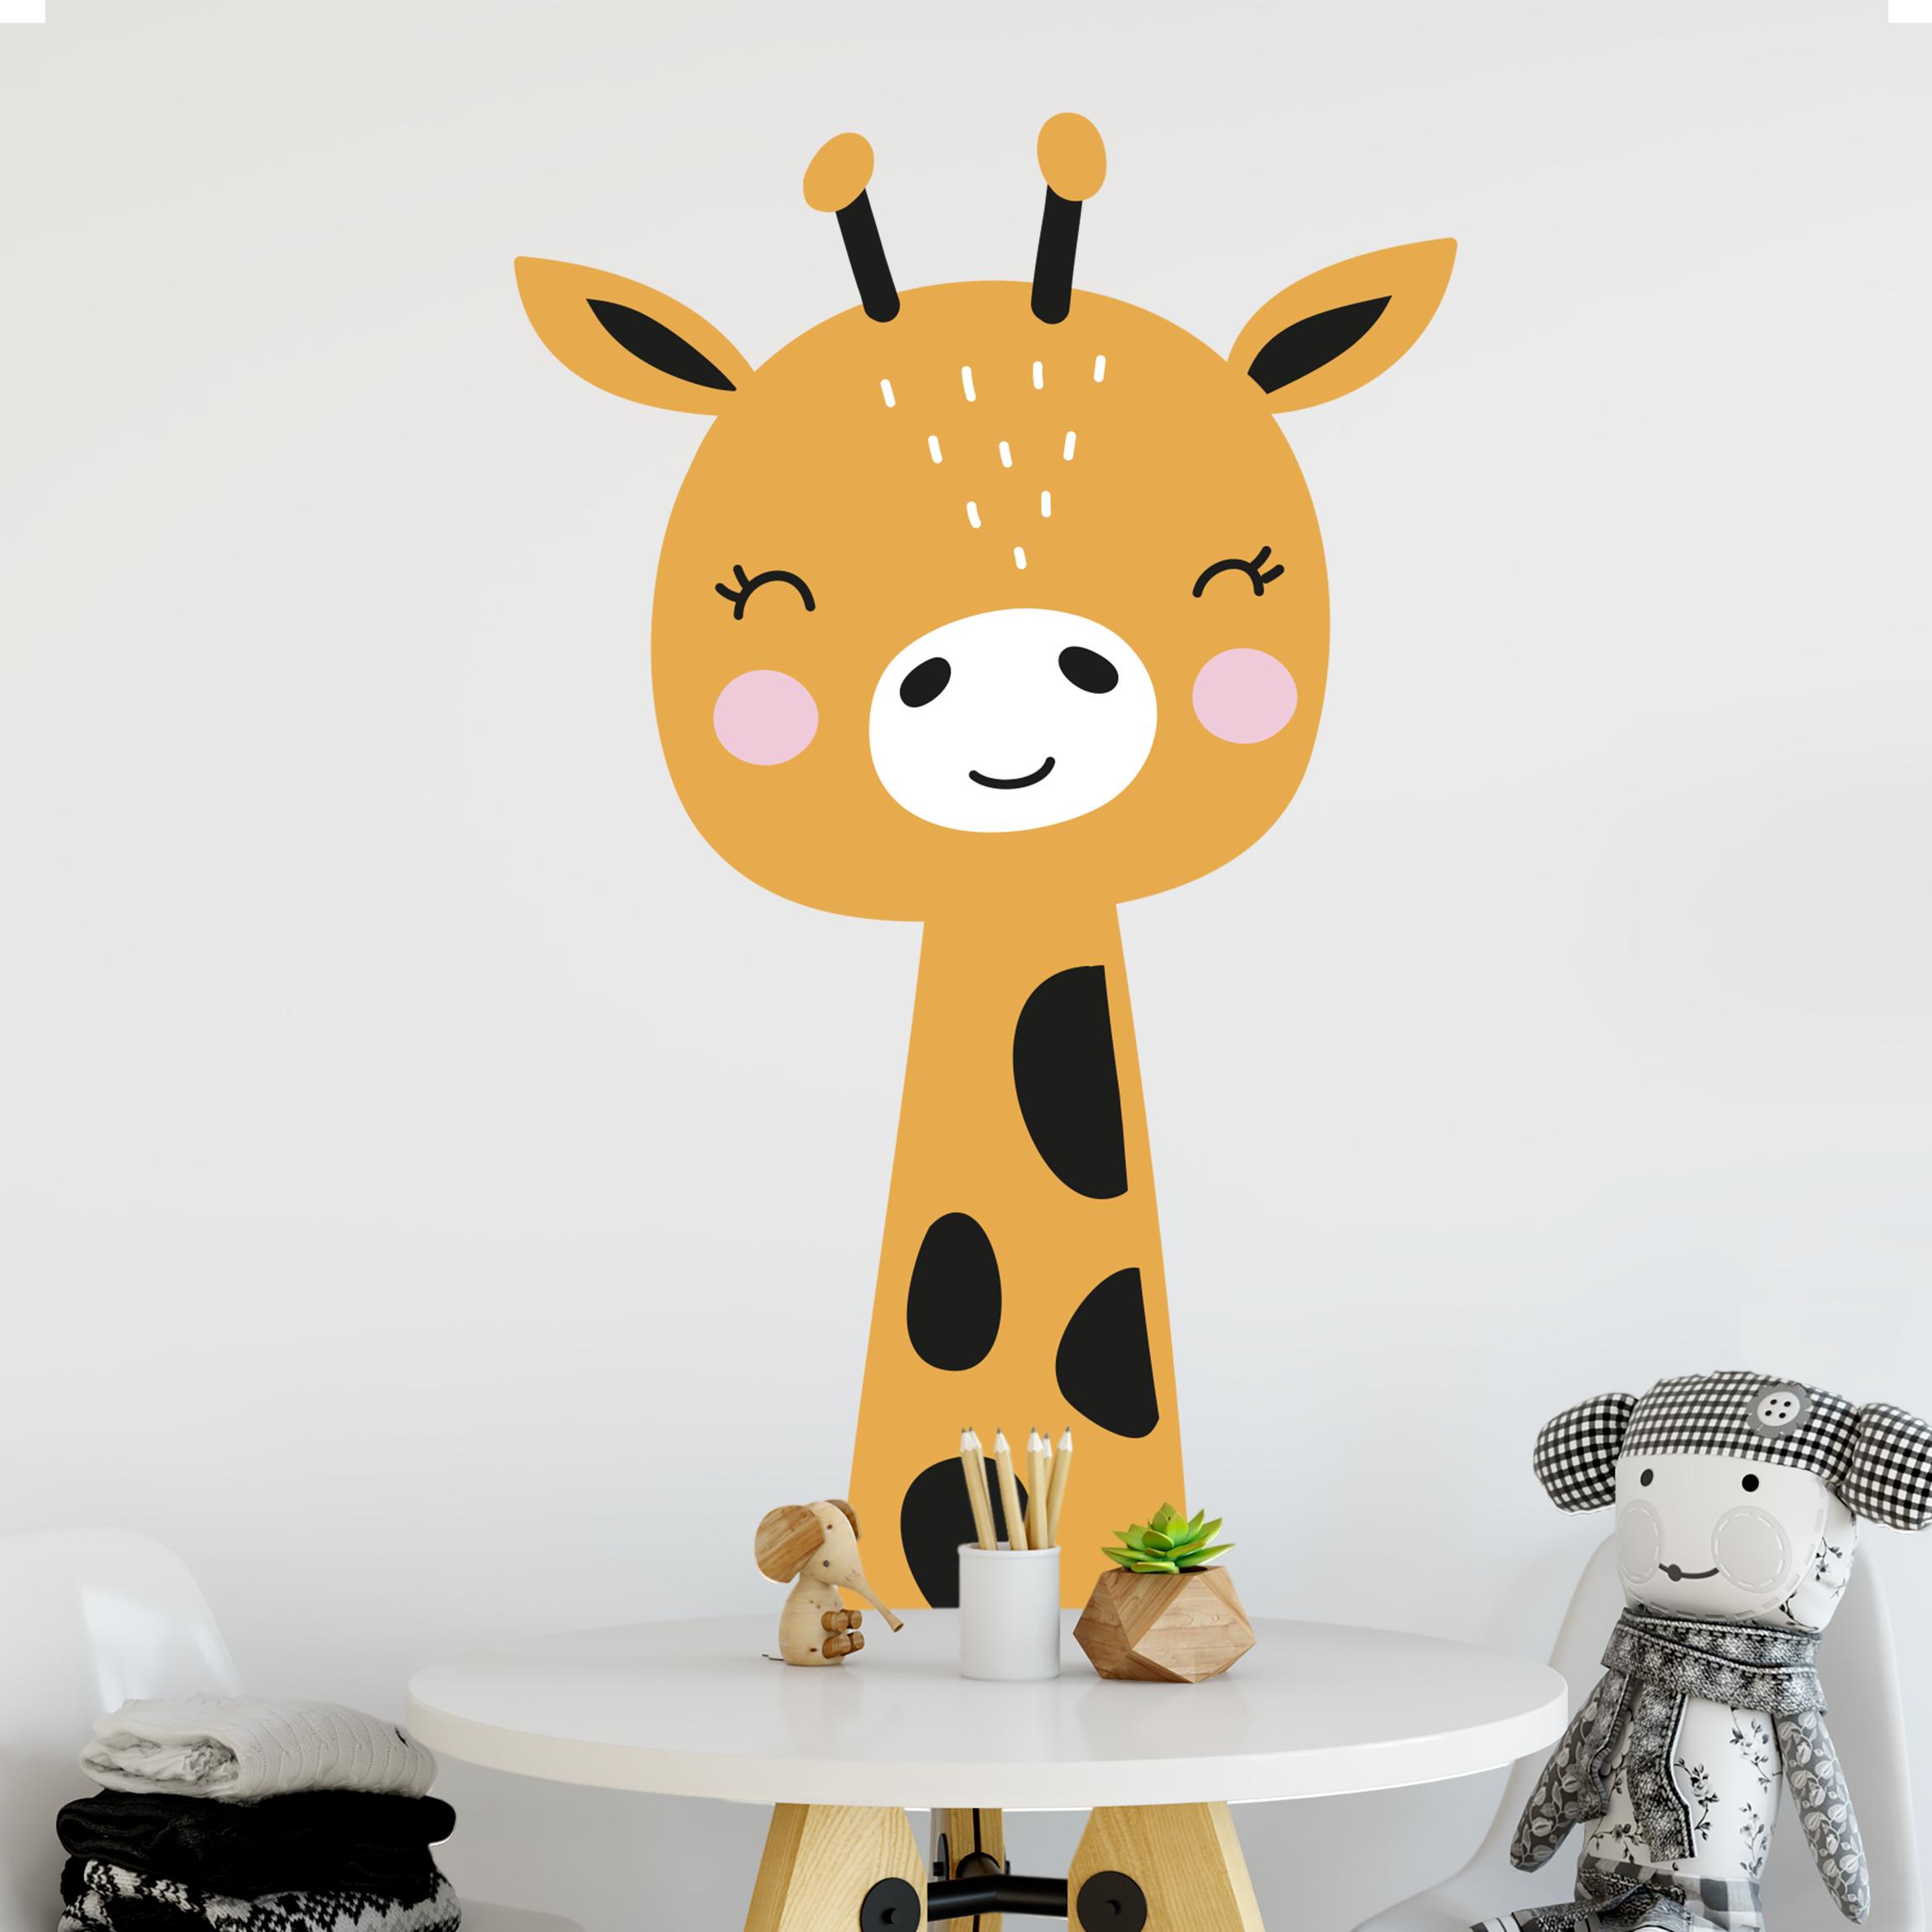 Wandtattoo Kinderzimmer - Baby Giraffe